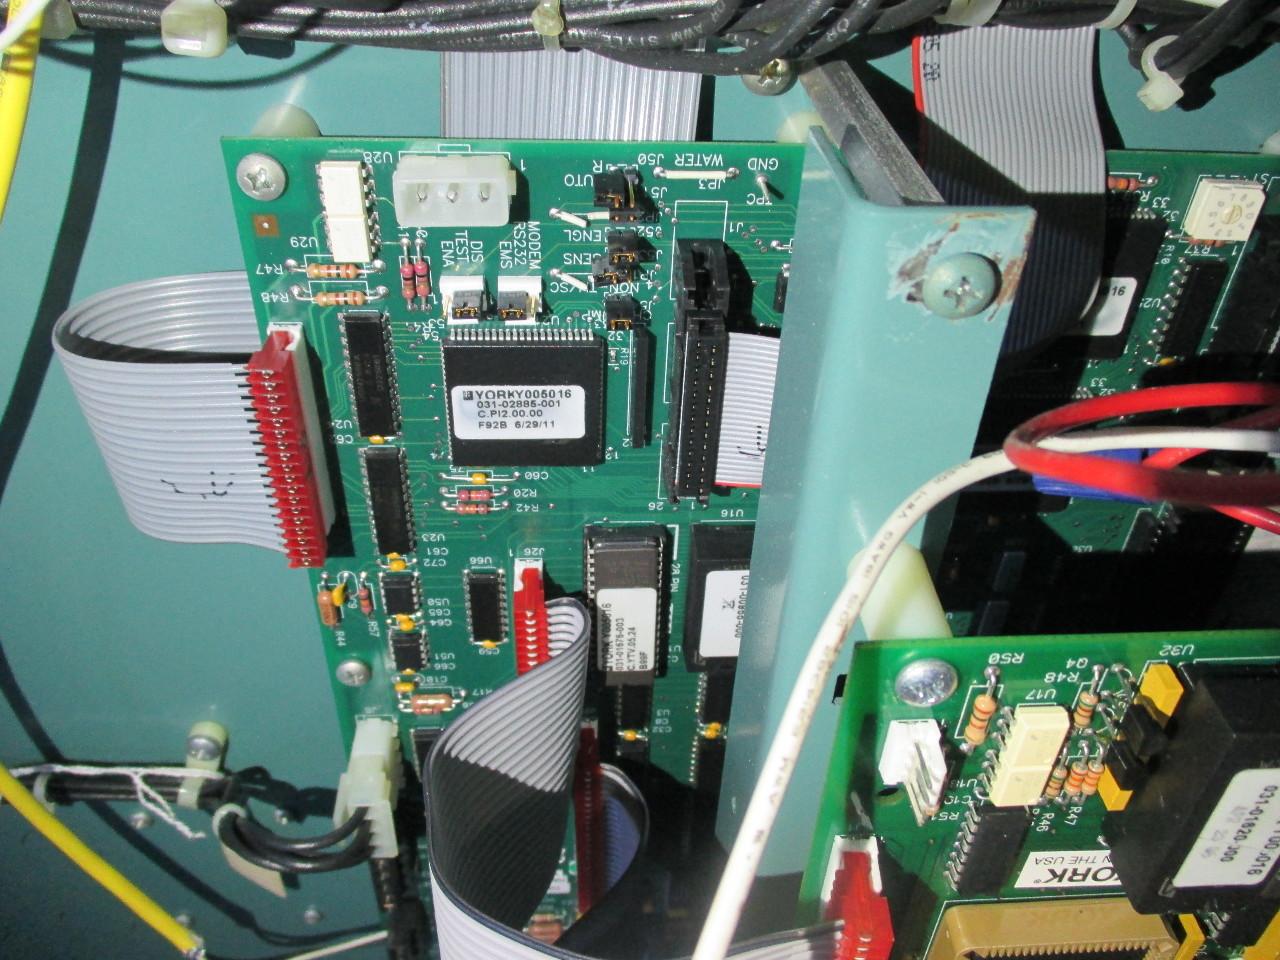 york predator wiring schematics york millennium schematics y14 york millennium centrifugal chiller vsd liquid chilling ...